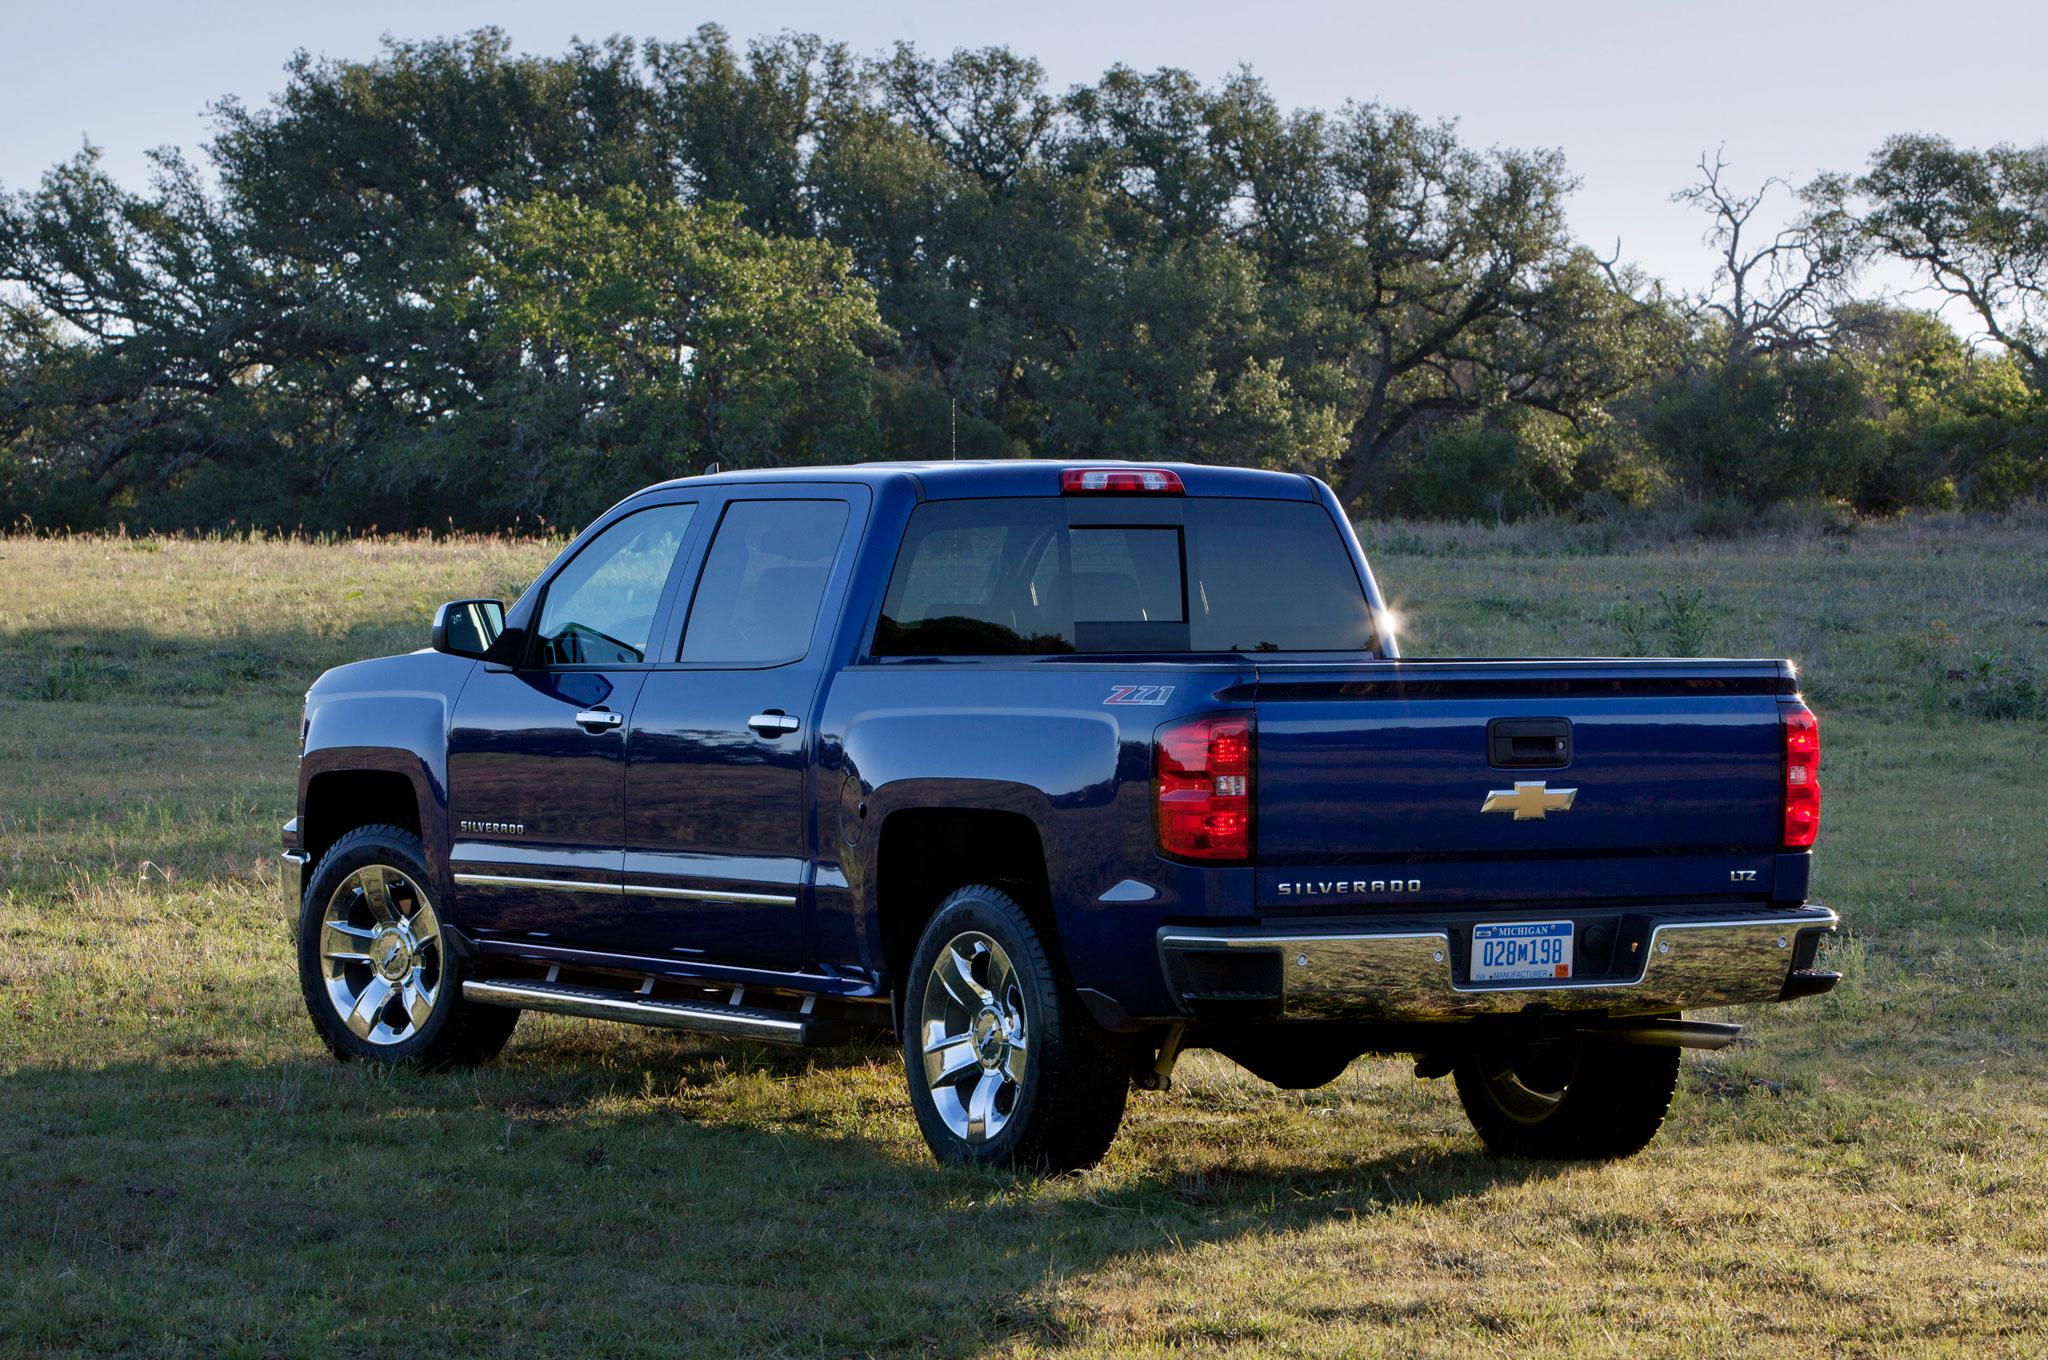 2014 Chevrolet Silverado Left Rear Angle1